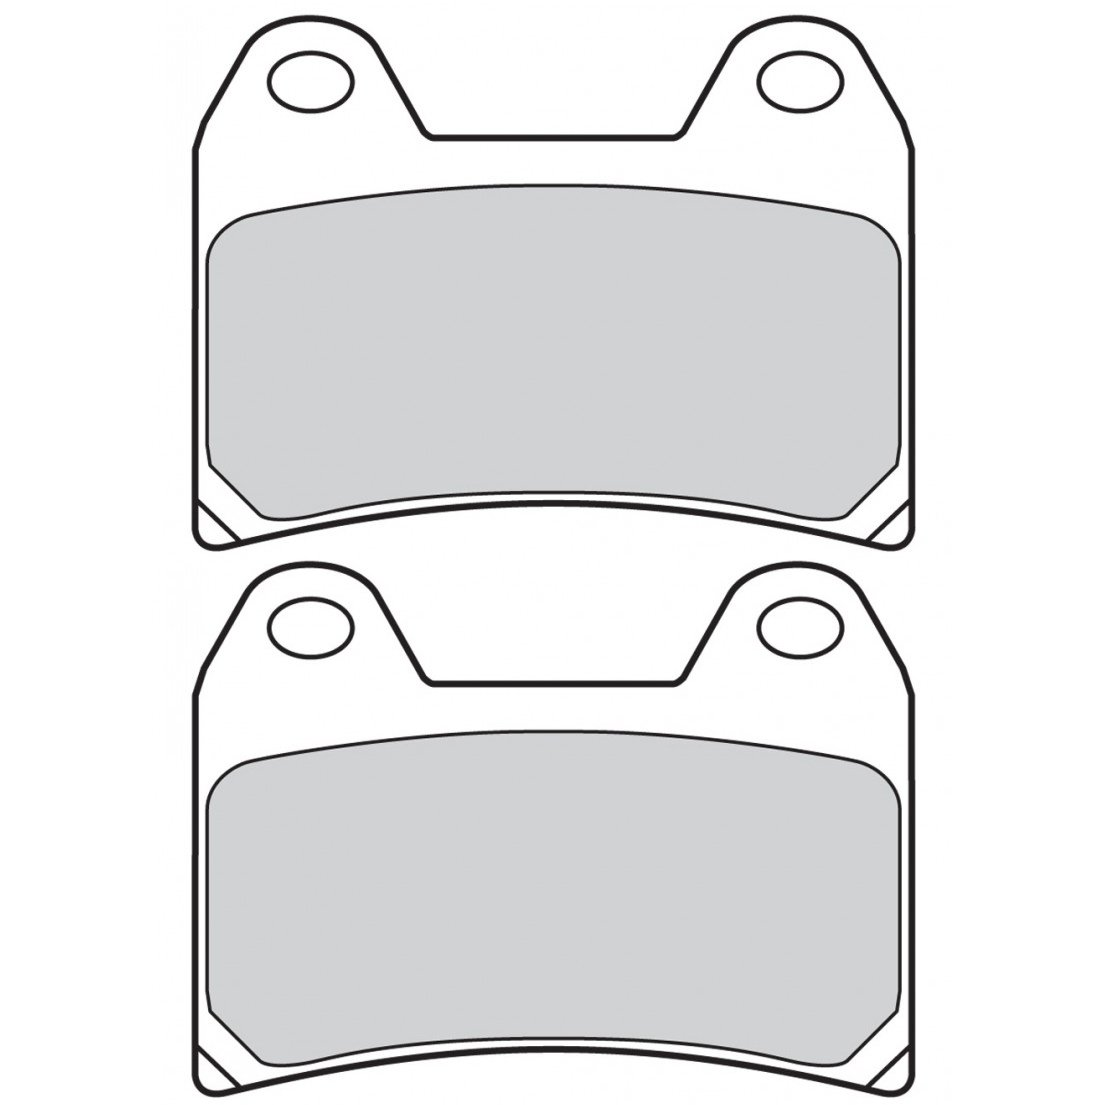 Колодки тормозные Brembo Z04 для Aprilia Tuono V4 03-05